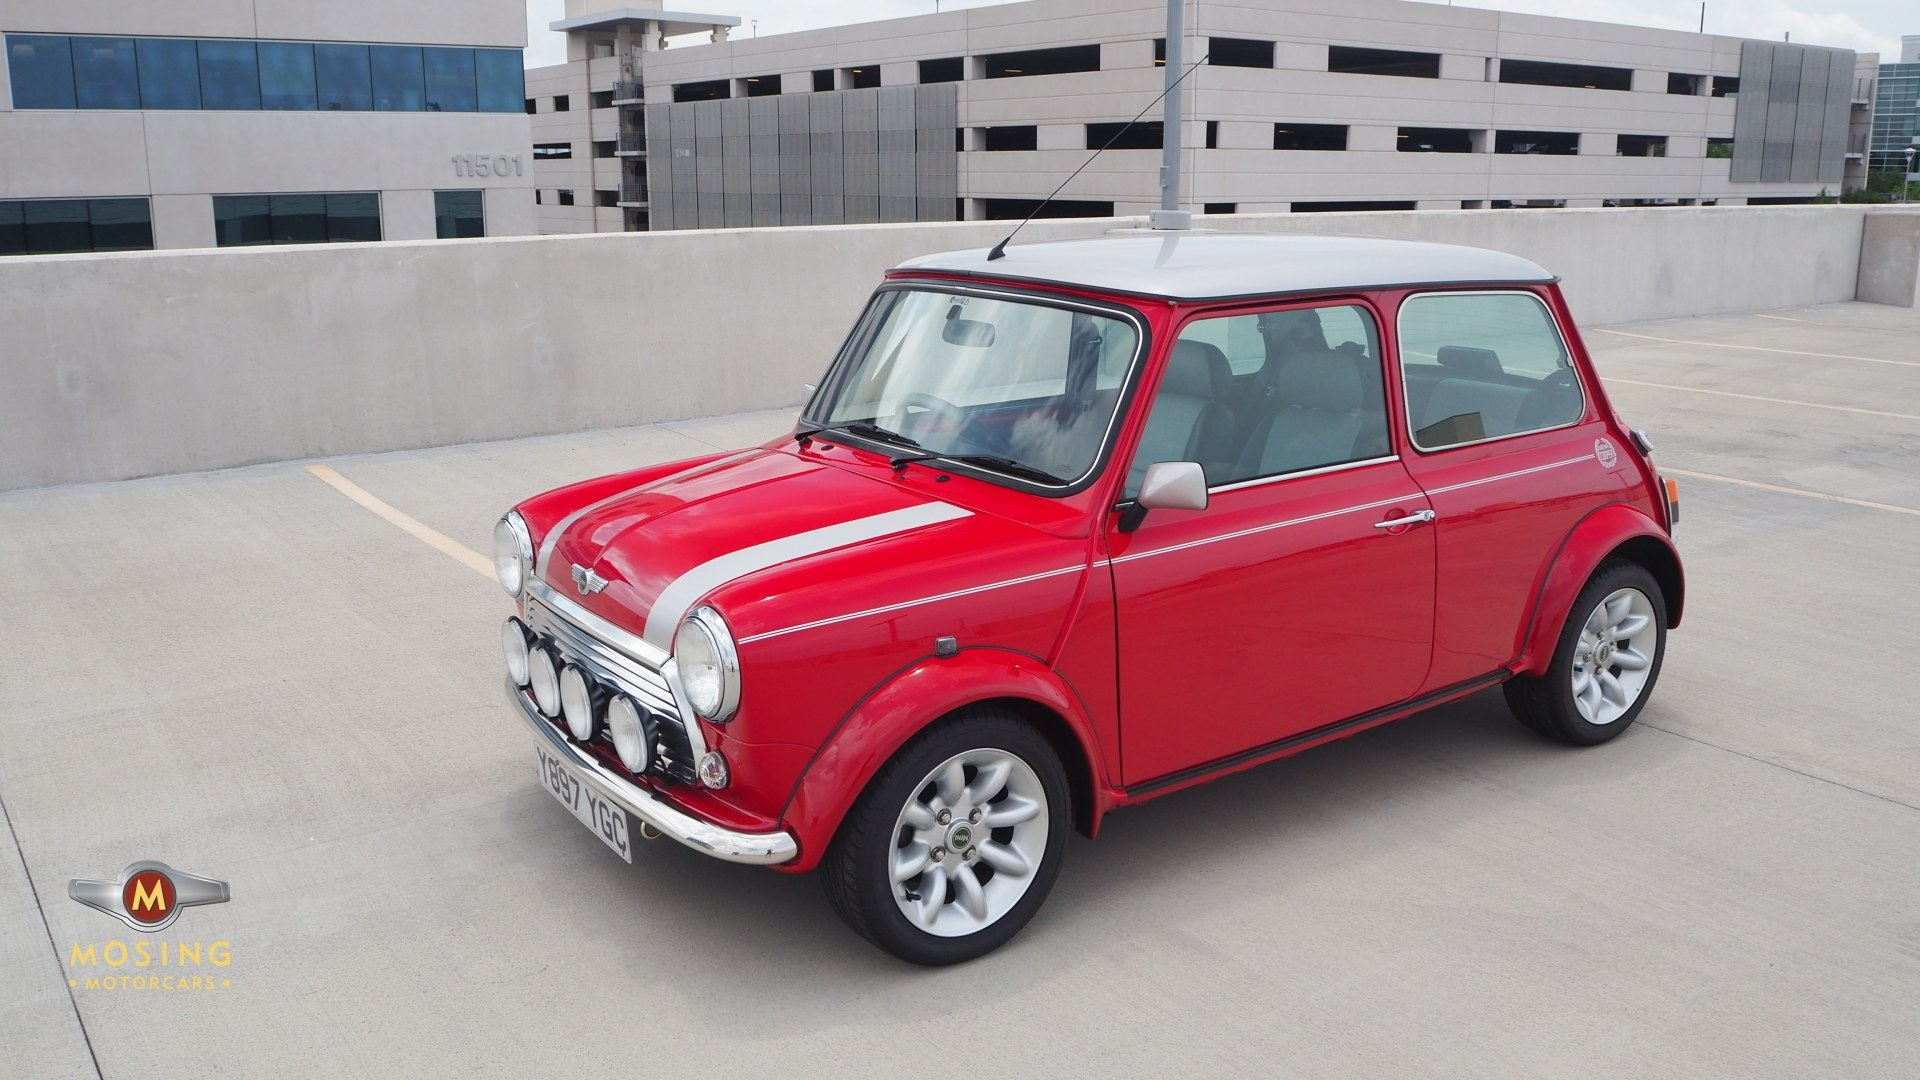 2000 austin mini classic cooper s500